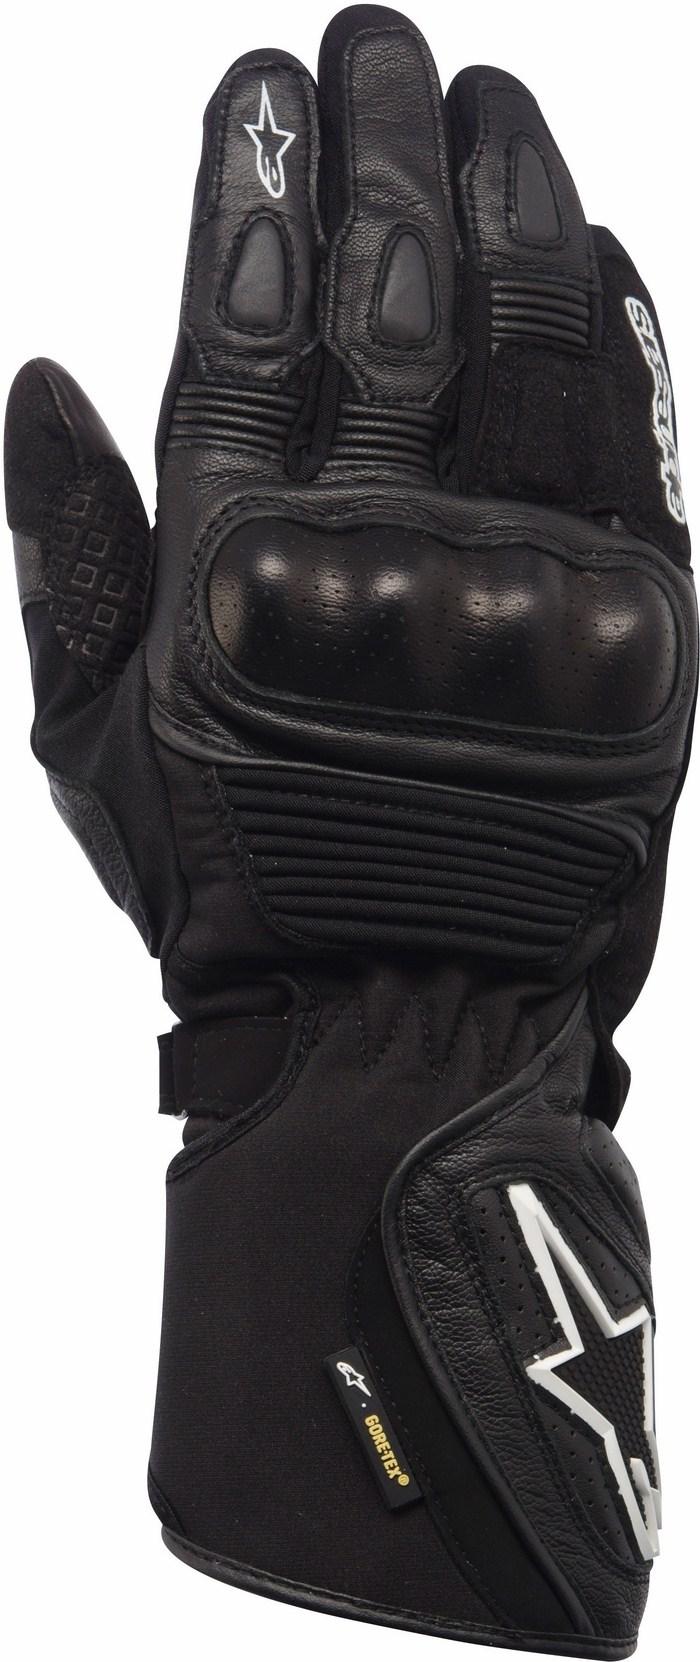 Alpinestars GT-S X-Trafit gloves black